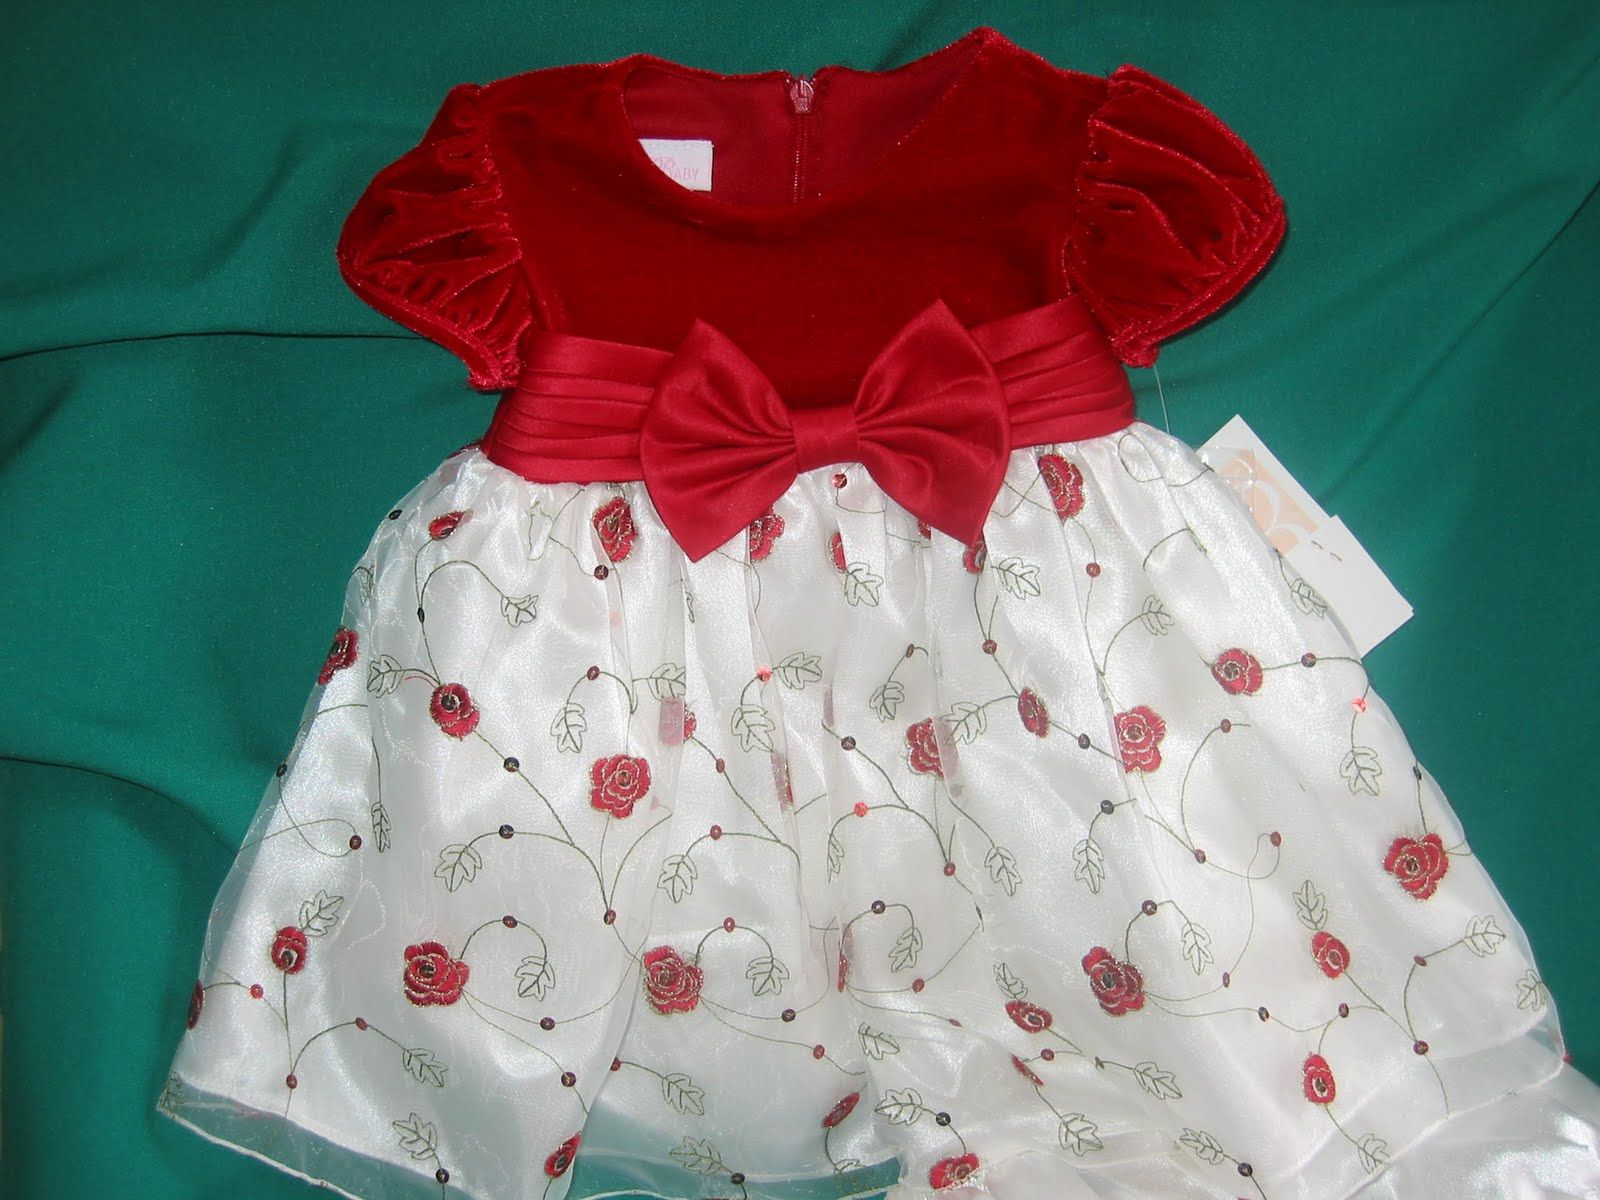 ropa de bebe de 11 meses